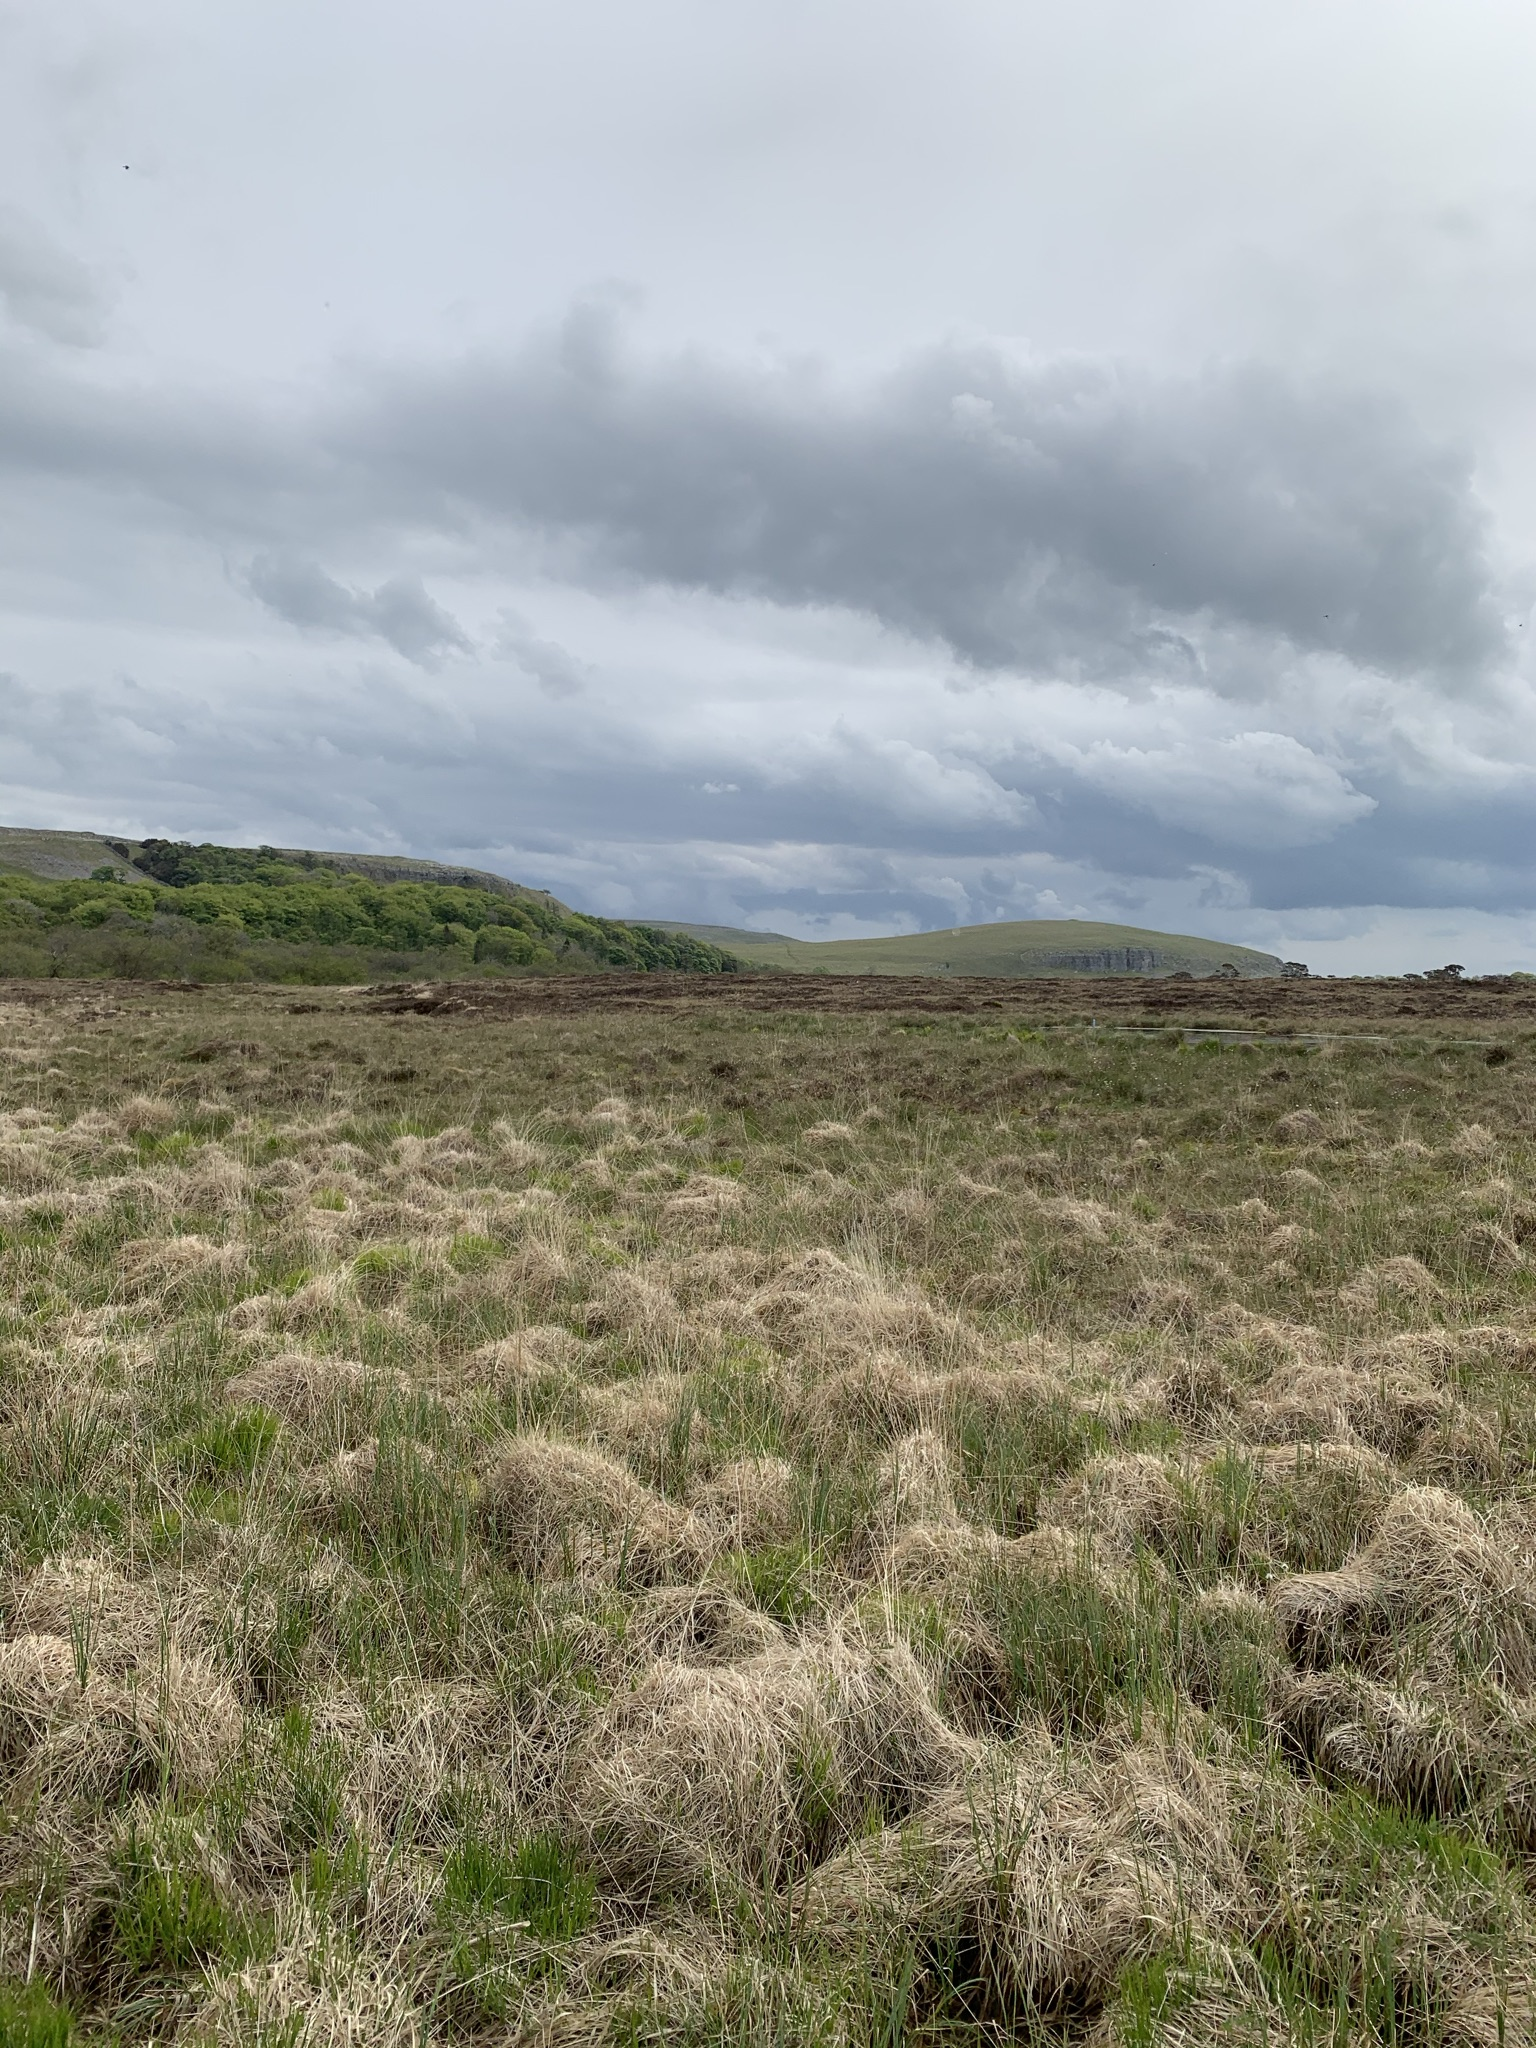 Deep peat land at Malham Tarn National Nature Reserve